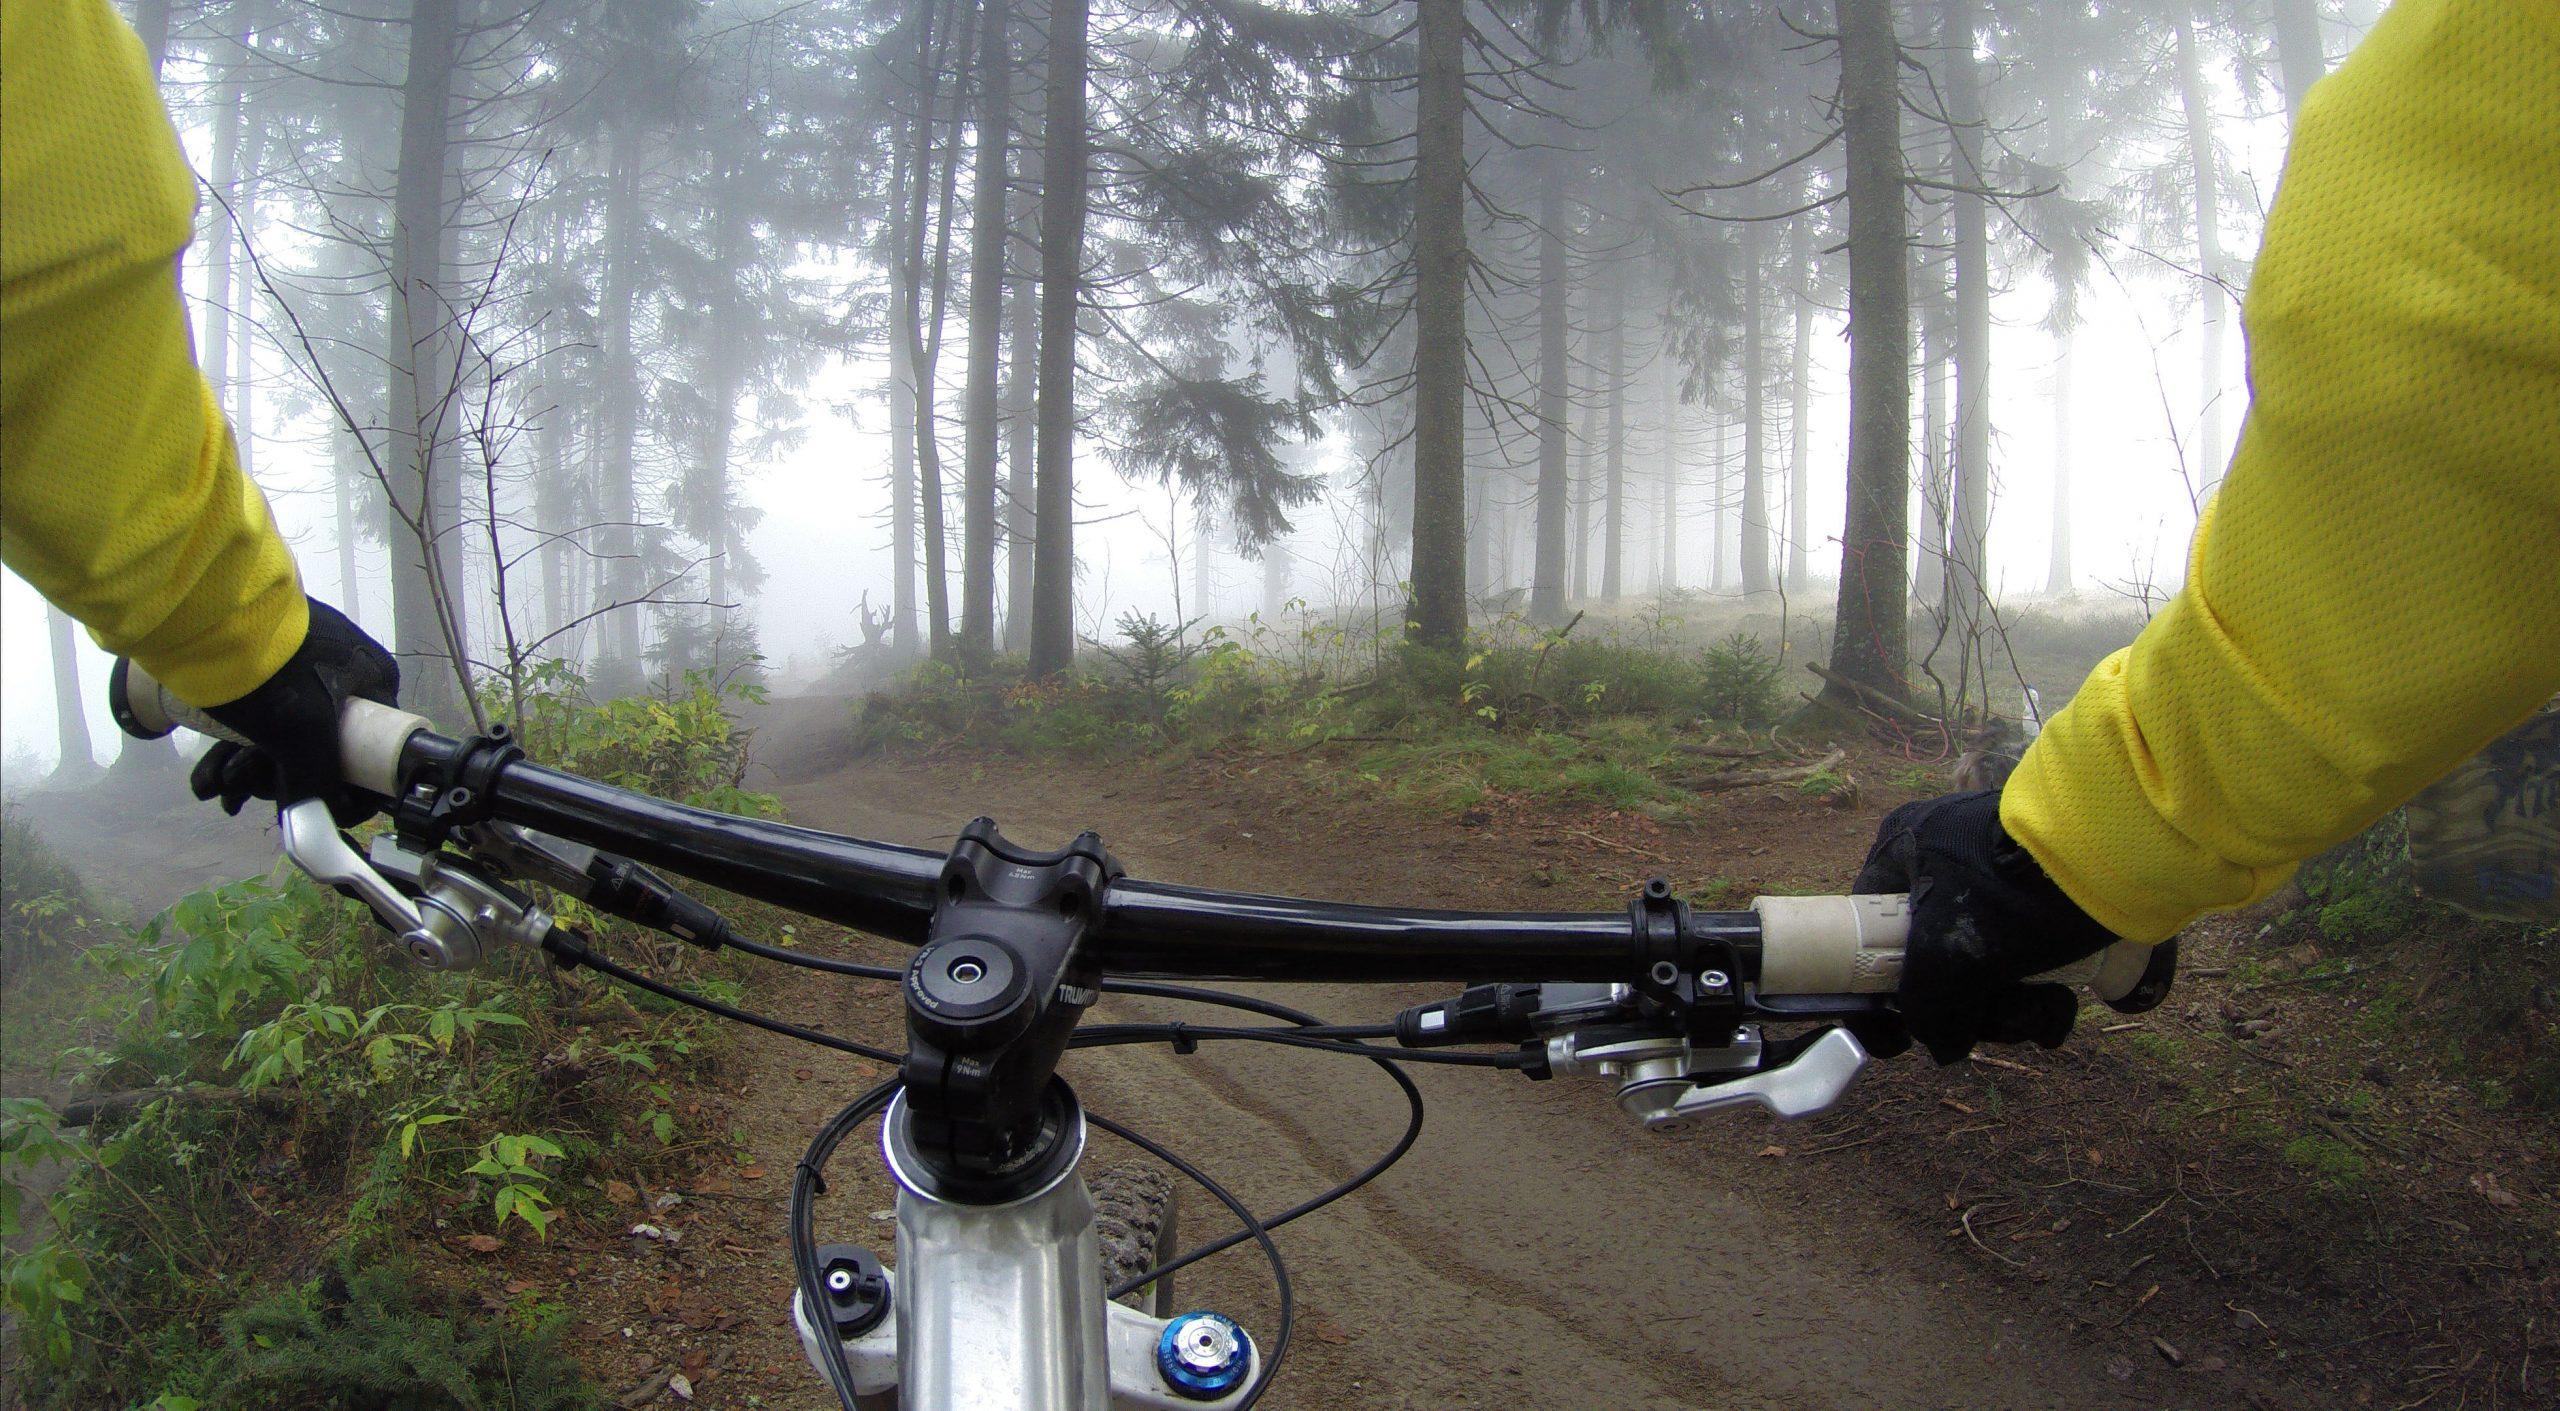 alexandra dech hI1DsDRJWvY unsplash scaled - Mountainbike om vinteren?